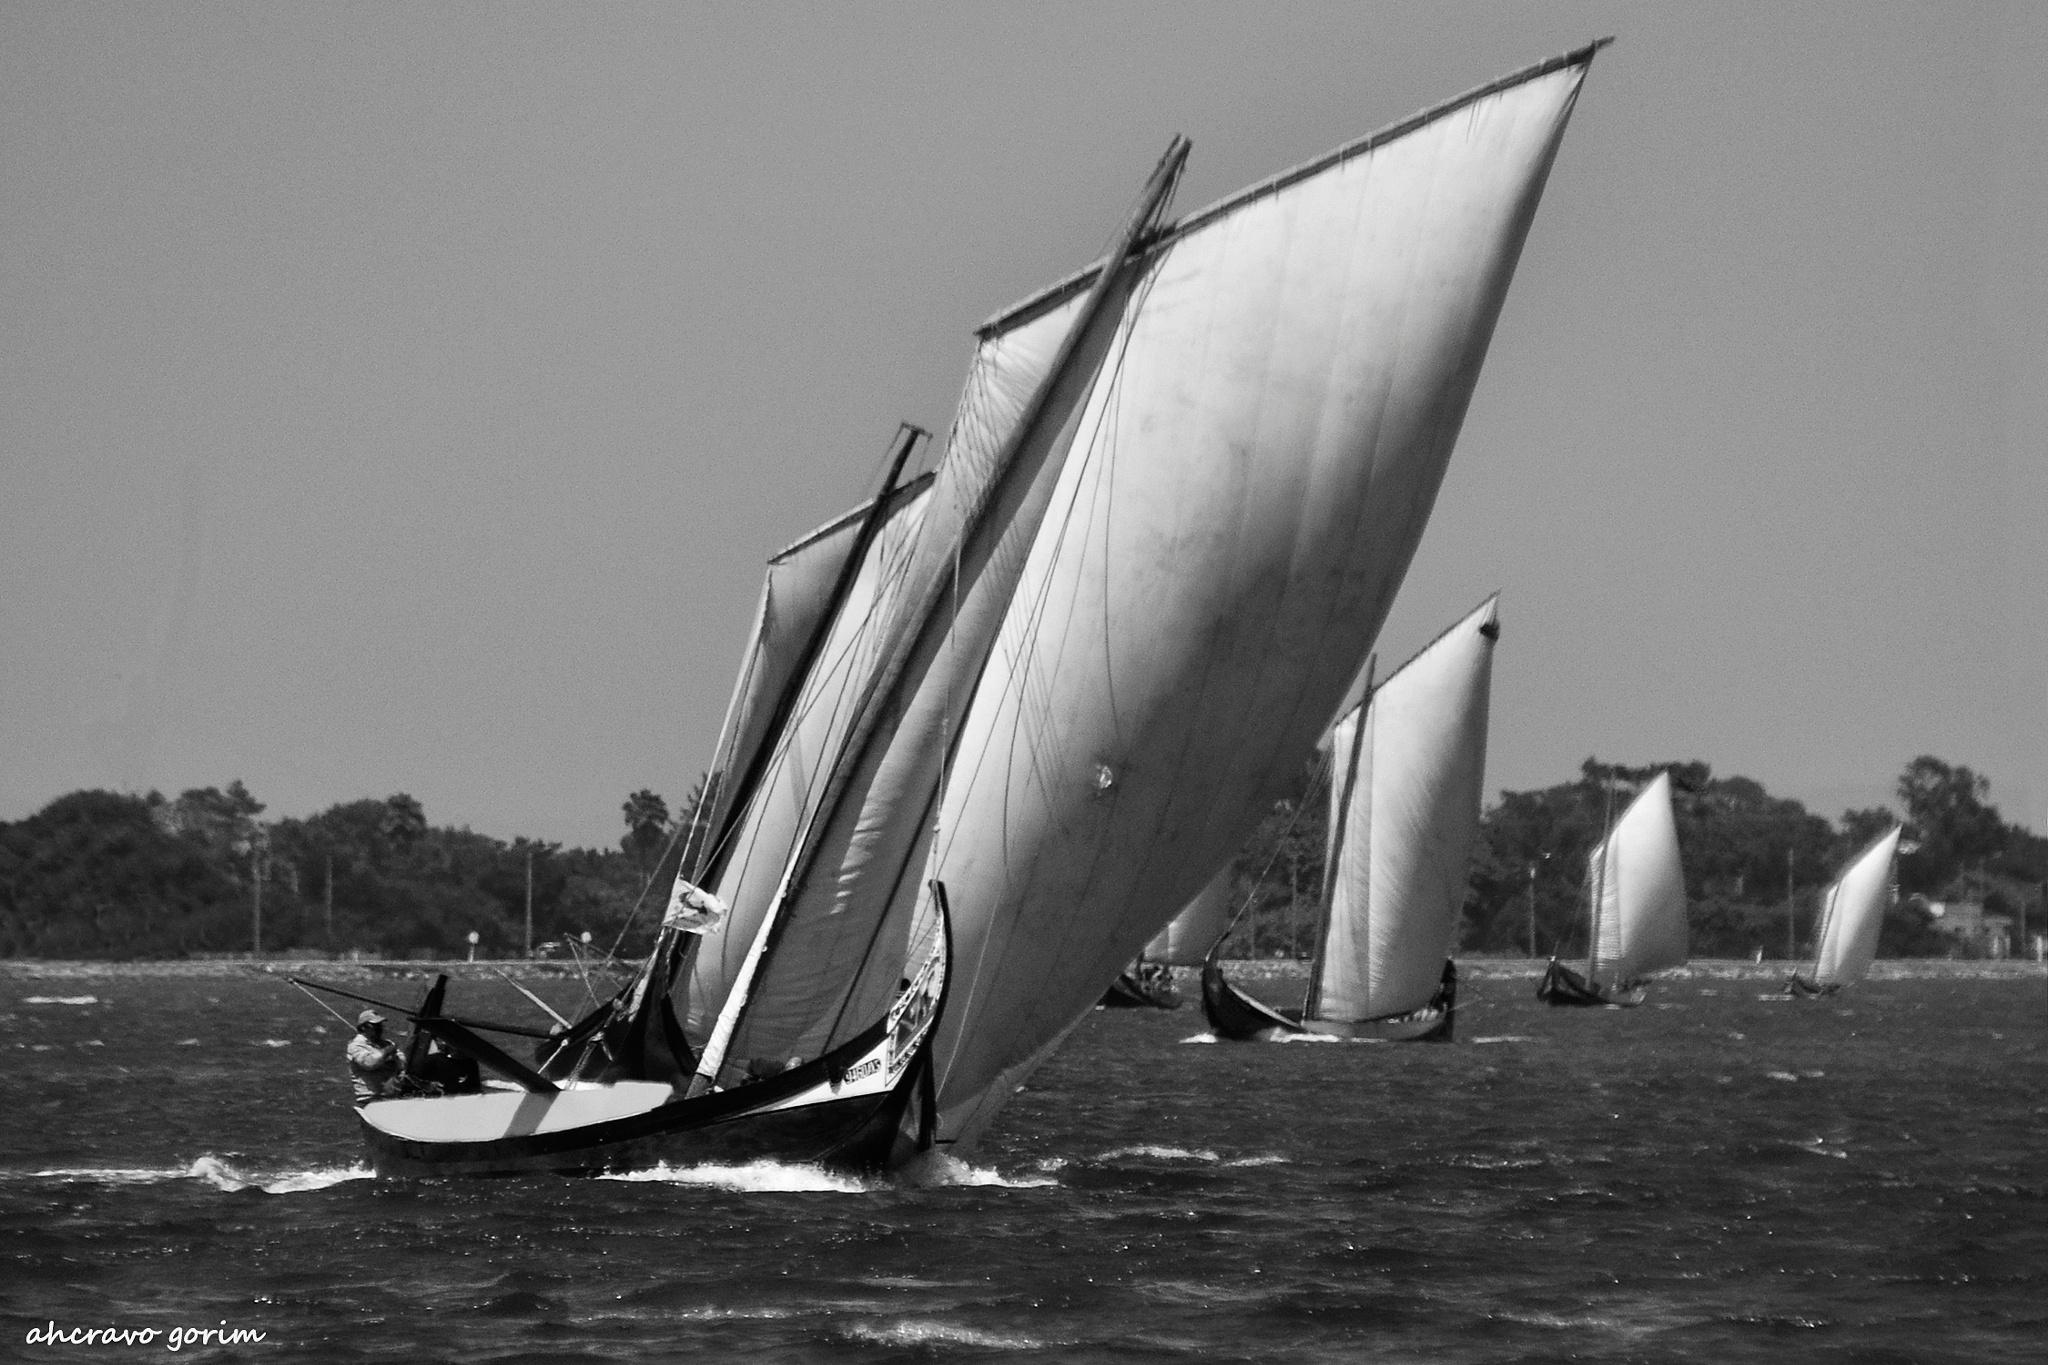 sailing for victory by ahcravo gorim